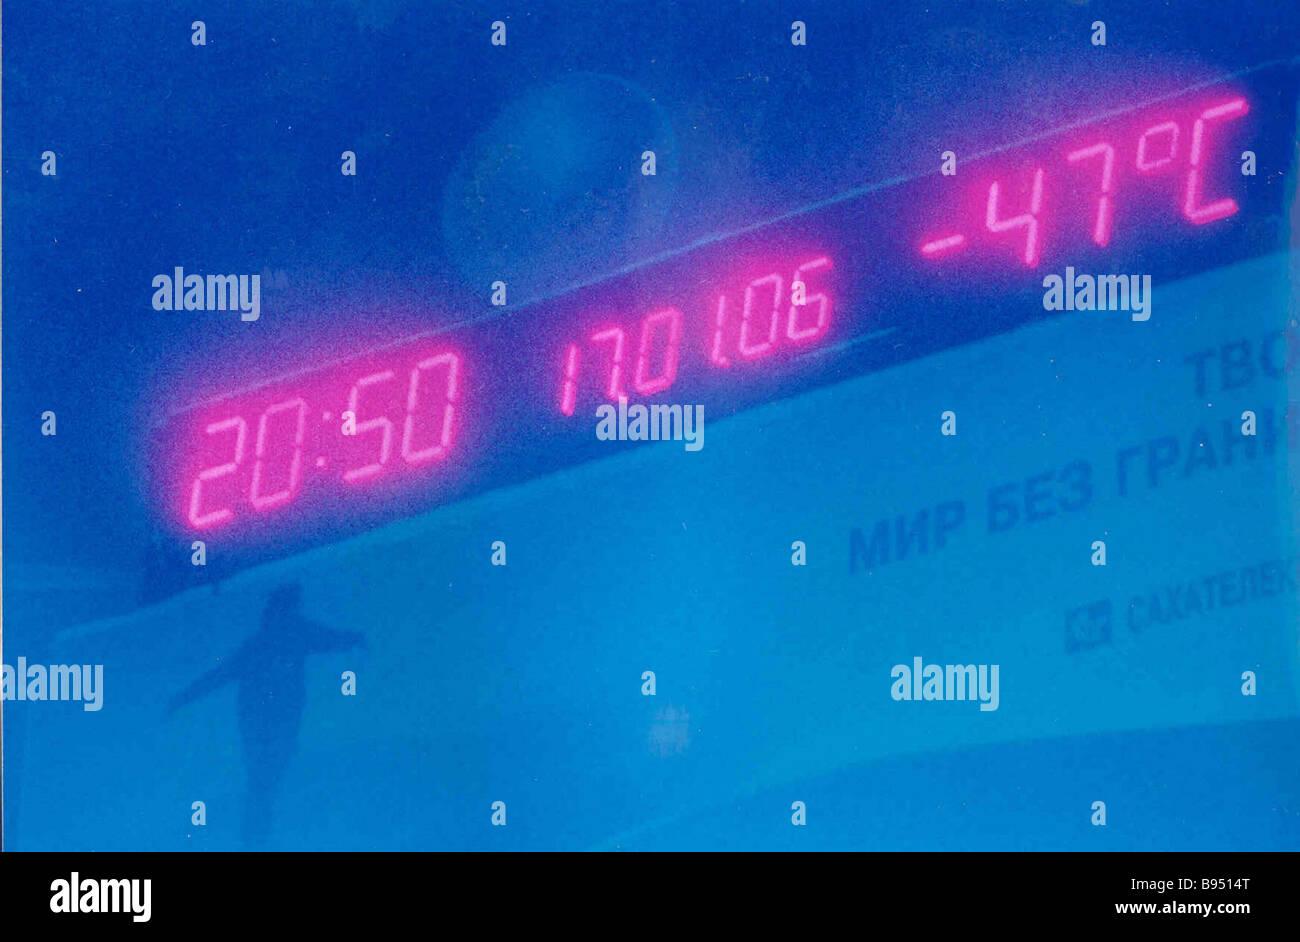 It is minus 47 degrees Celsius in Yakutsk - Stock Image